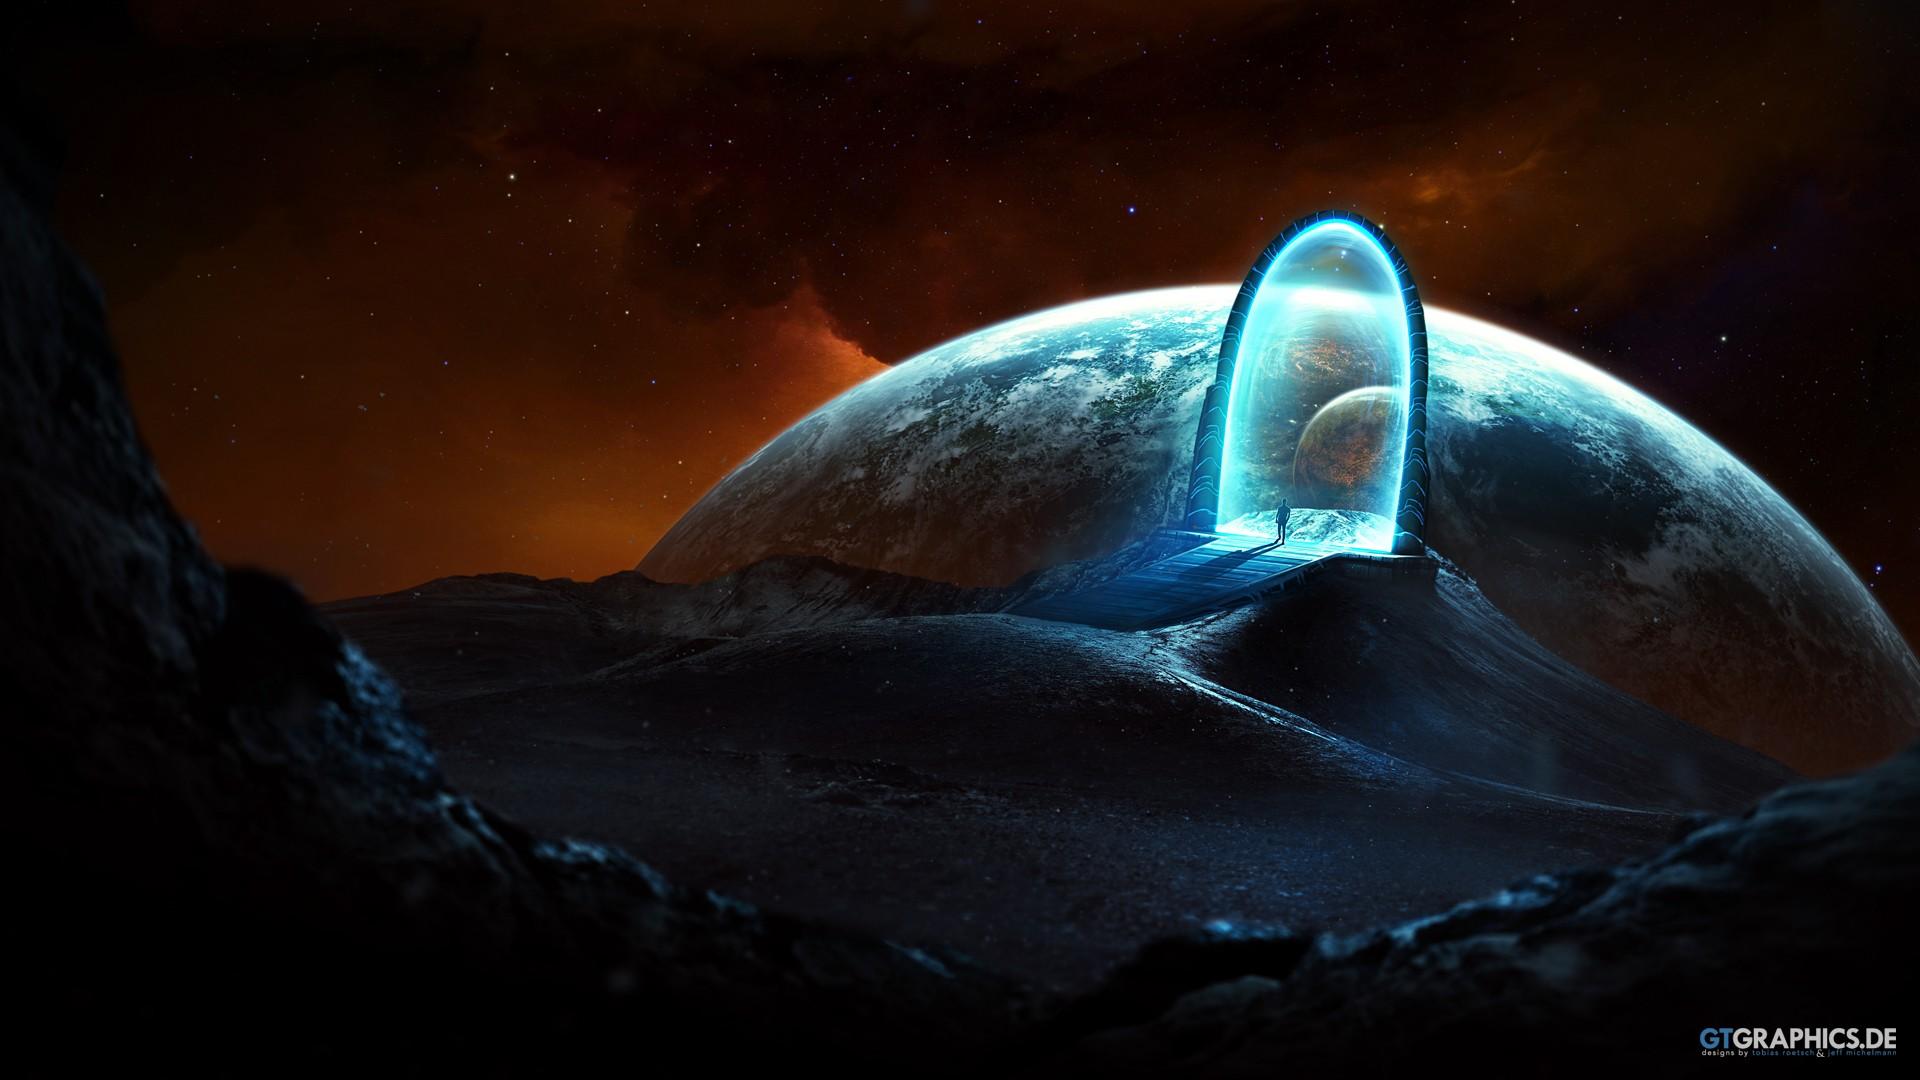 General 1920x1080 fantasy art space digital art science fiction planet gates artwork Taenaron space art